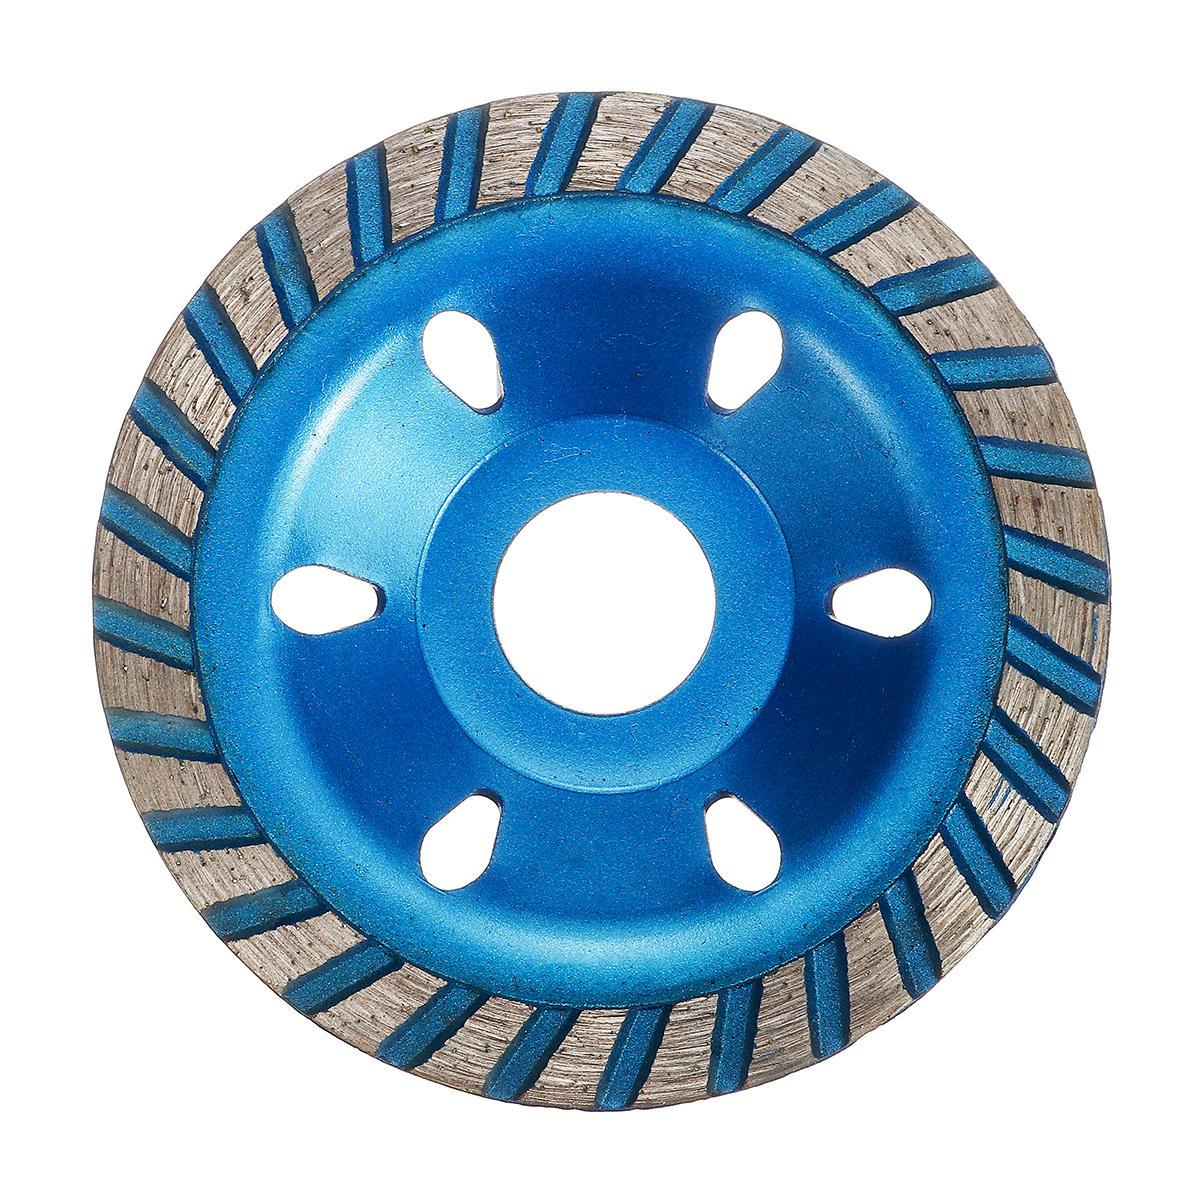 100mm Segment Diamond Grinding Wheel Abrasive Tools Disc Concrete Masonry Stone Blue